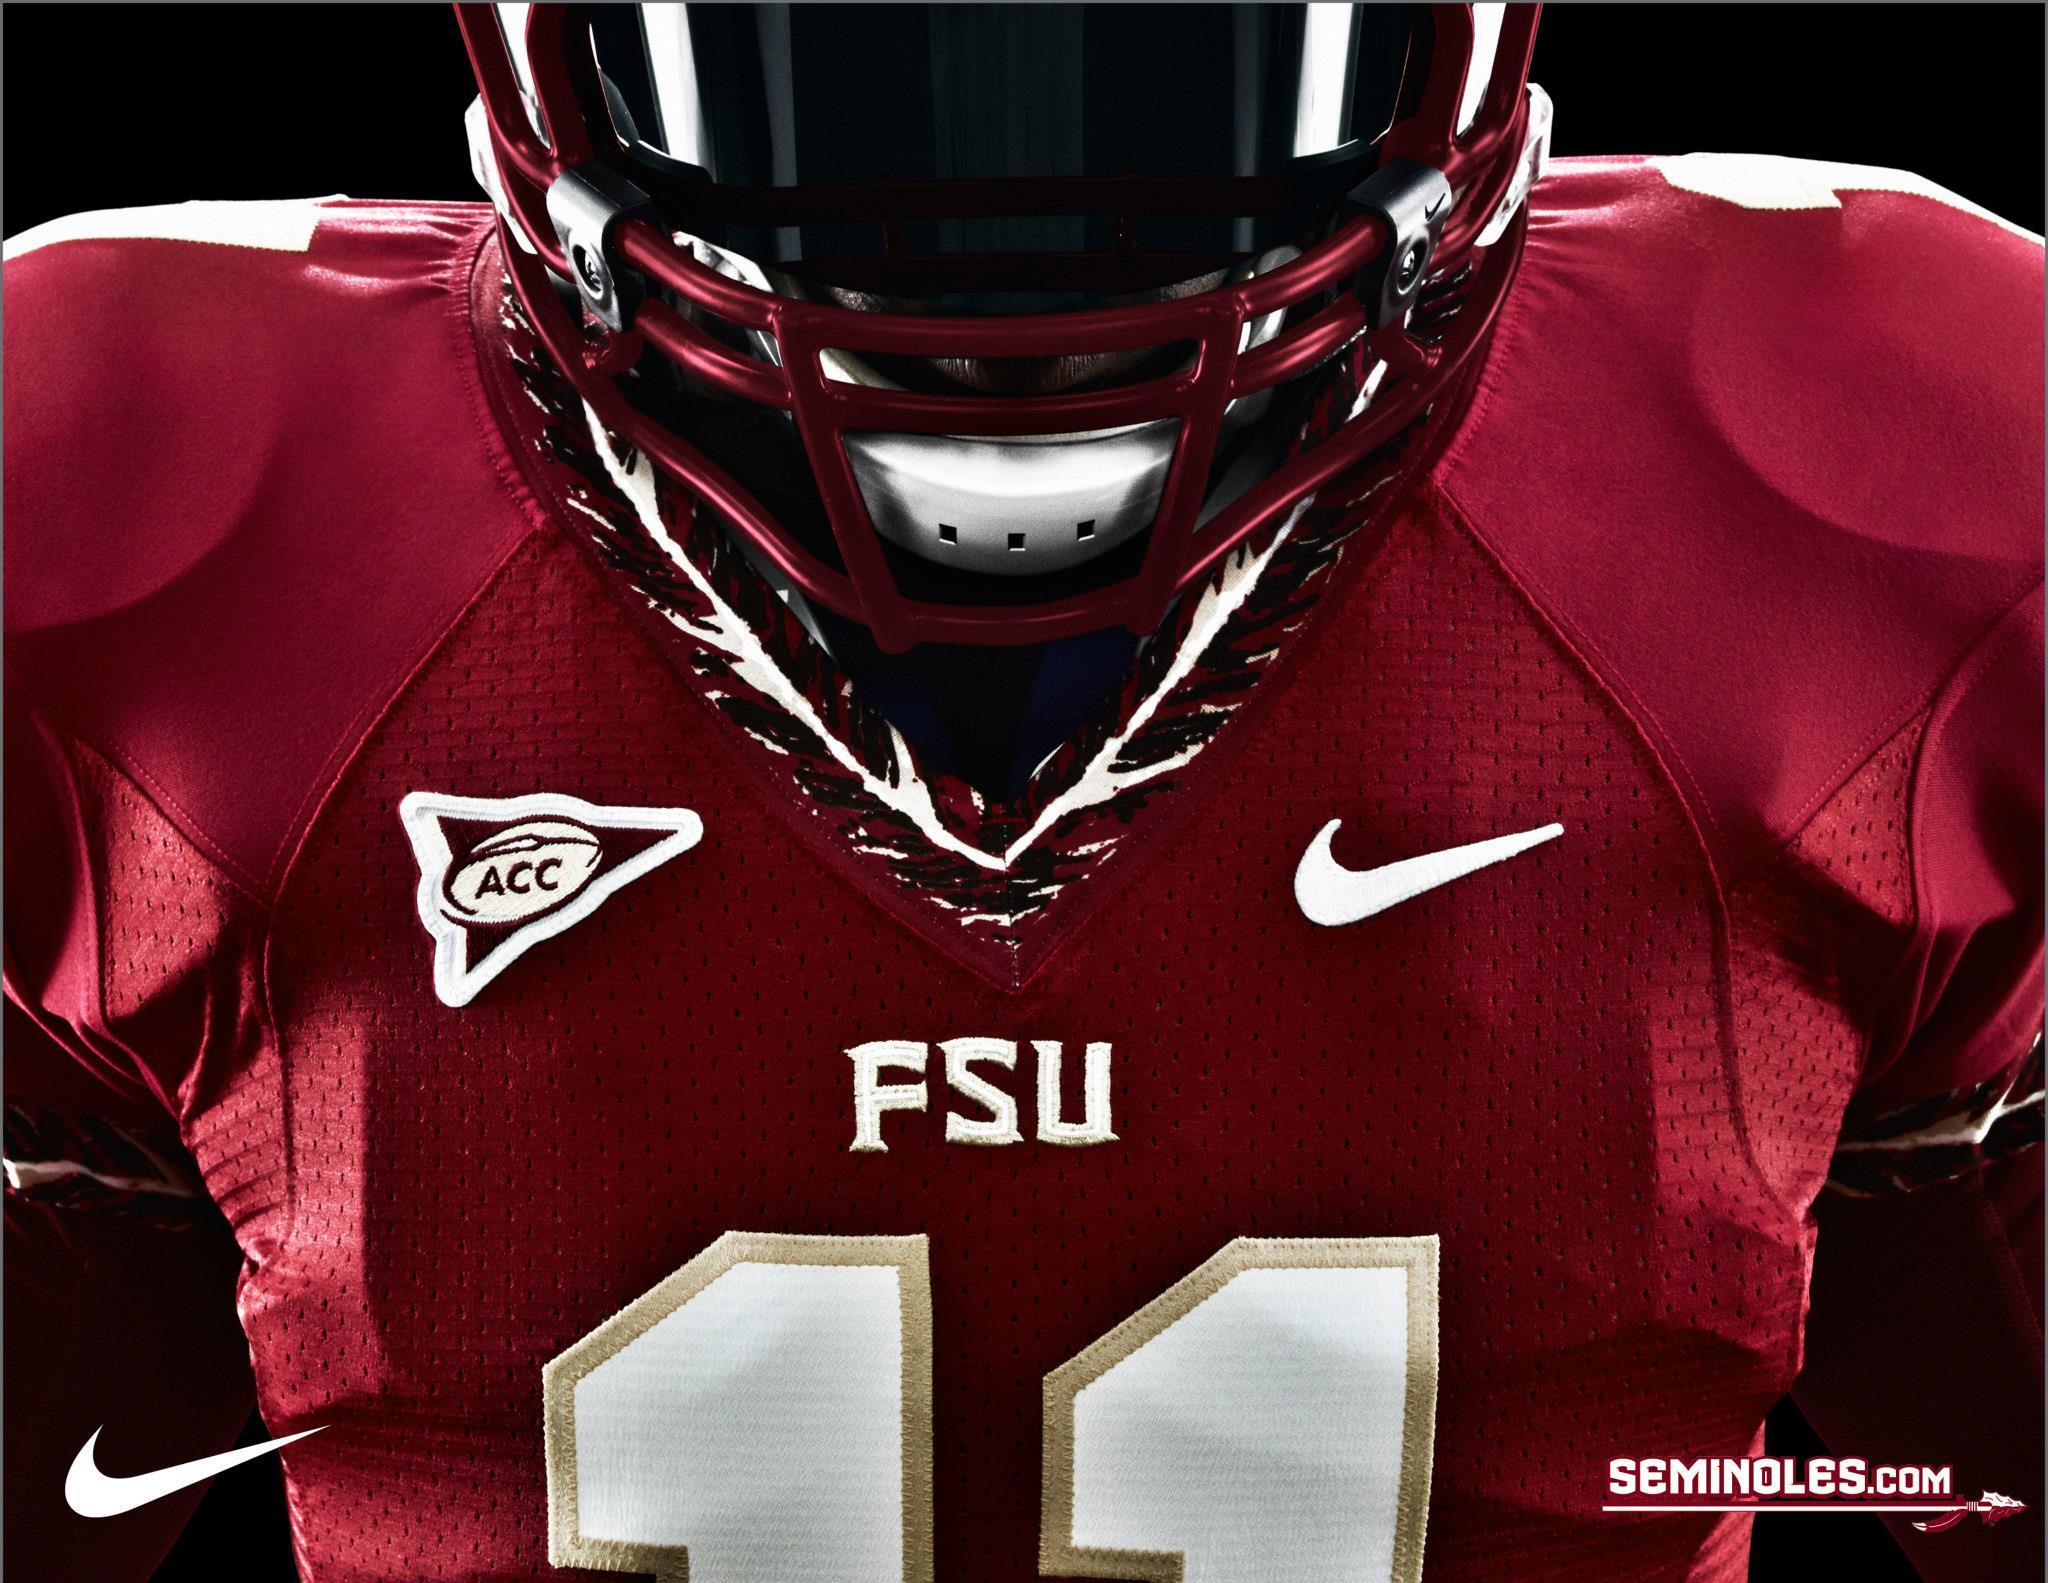 FORIDA STATE SEMINOLES college football 15 wallpaper background 2048x1583